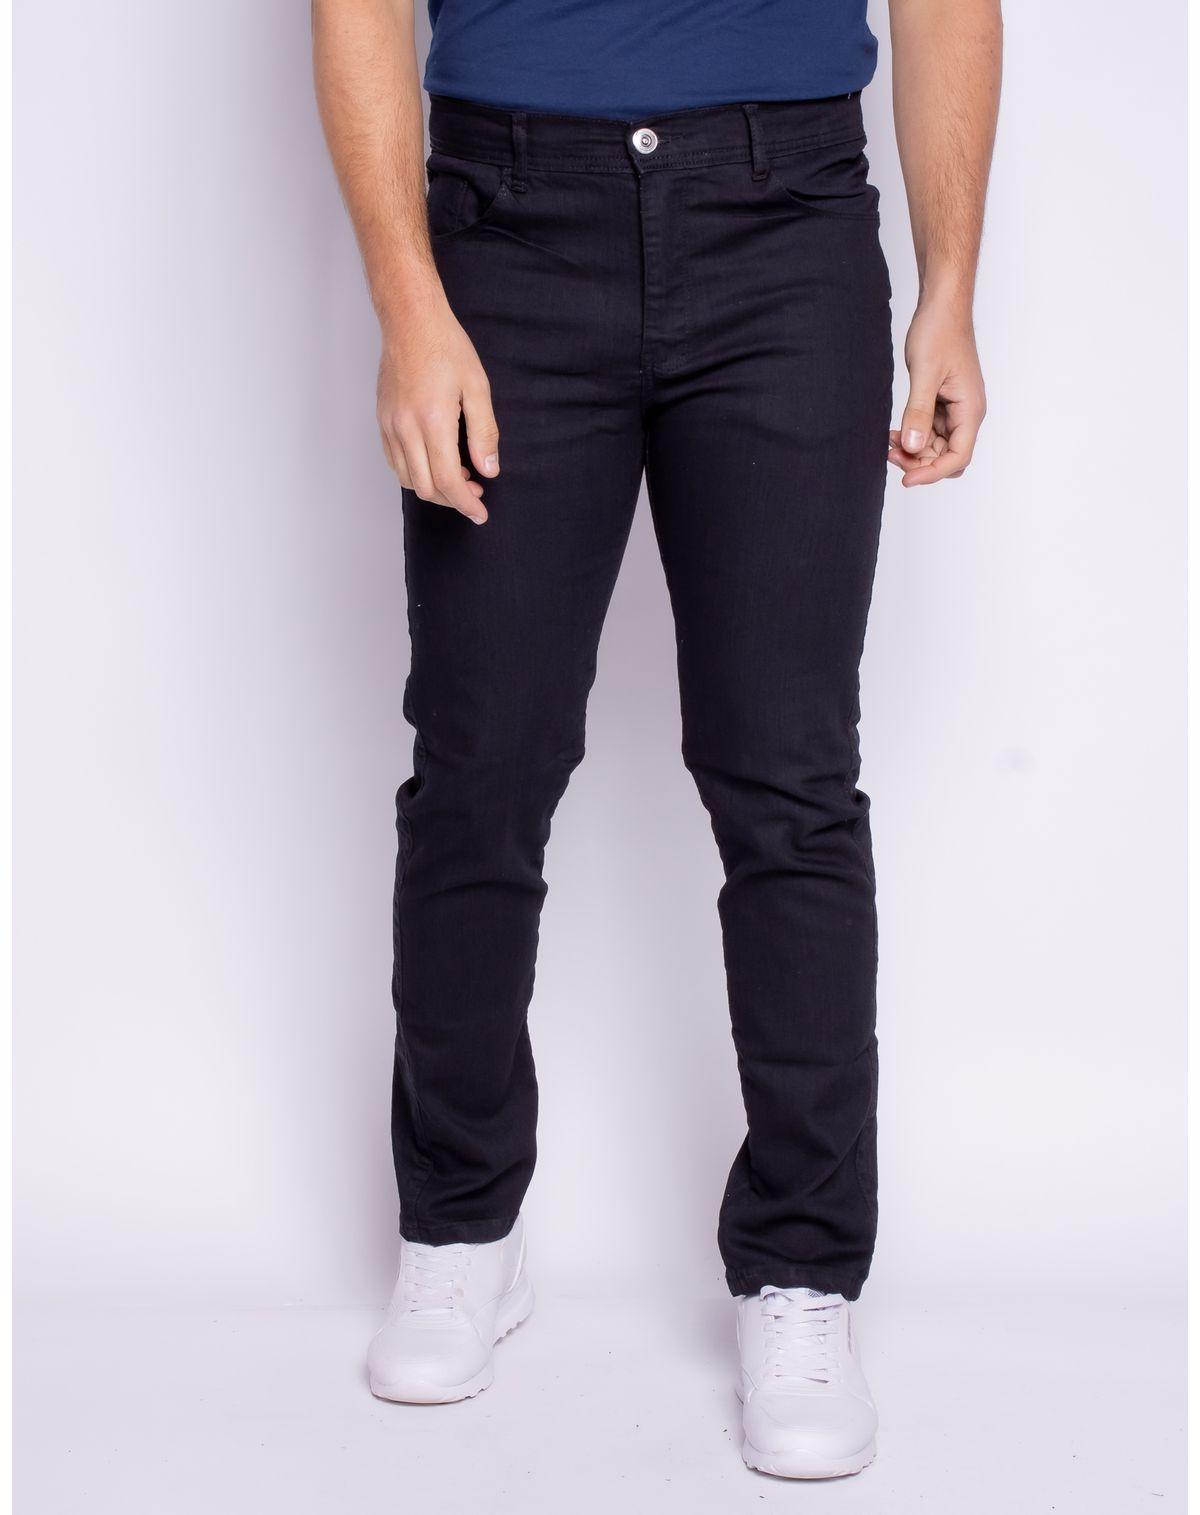 510615001-calca-sarja-skinny-masculina-elastano-black-38-601